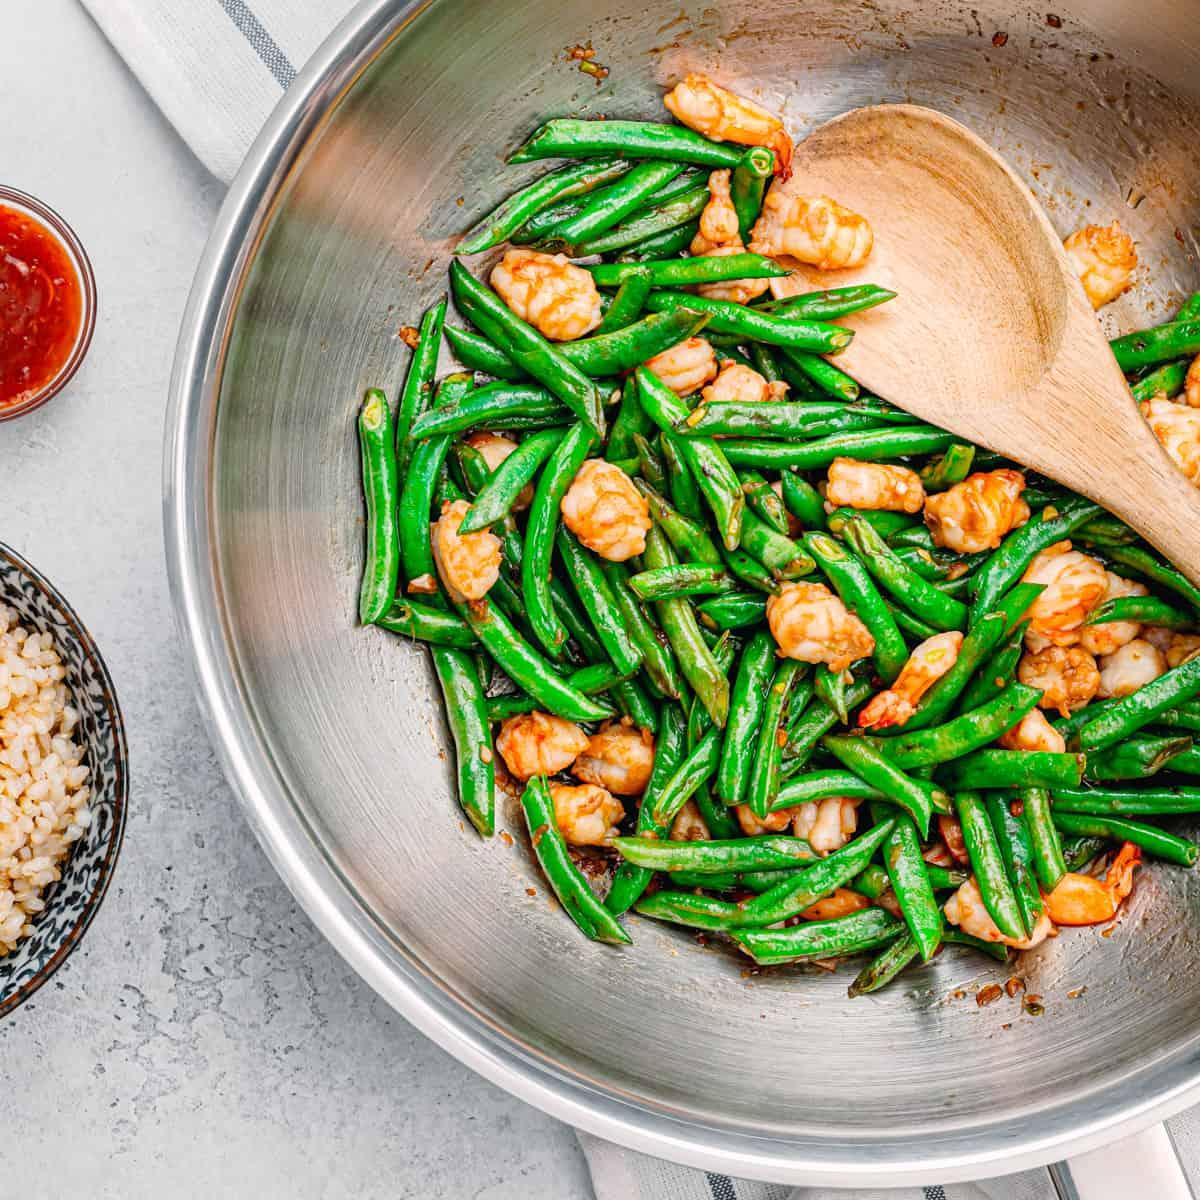 stir-fried green beans with shrimp.